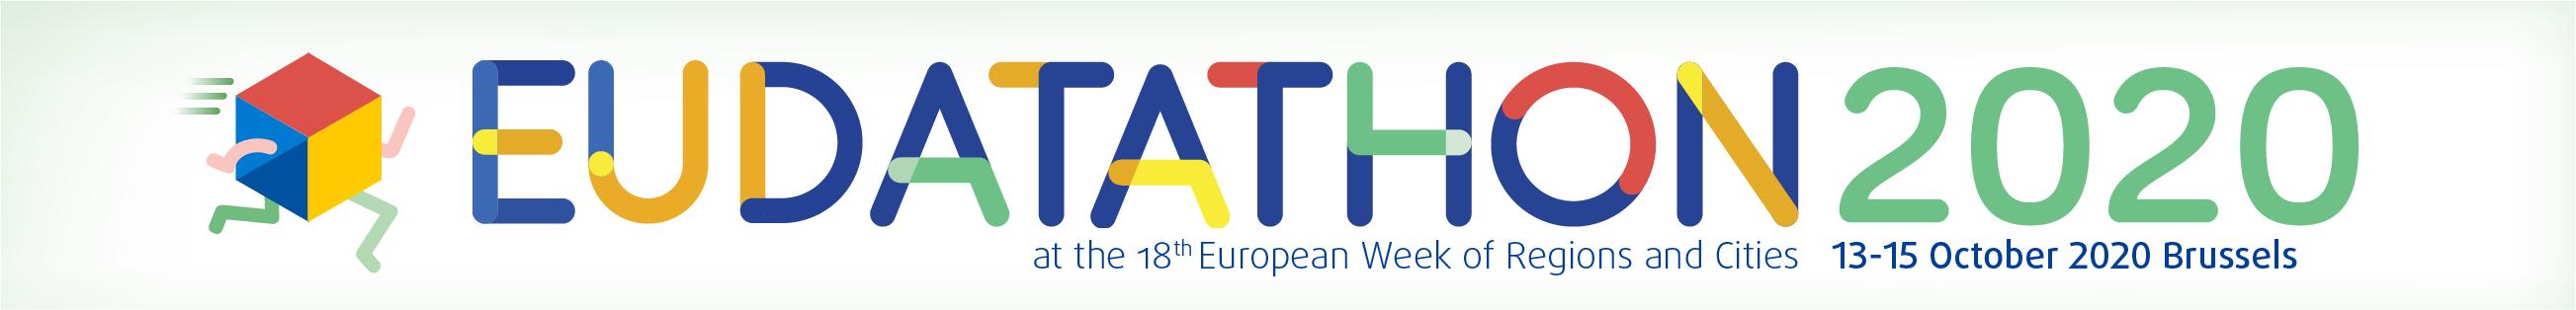 EU Datathon 2020 banner